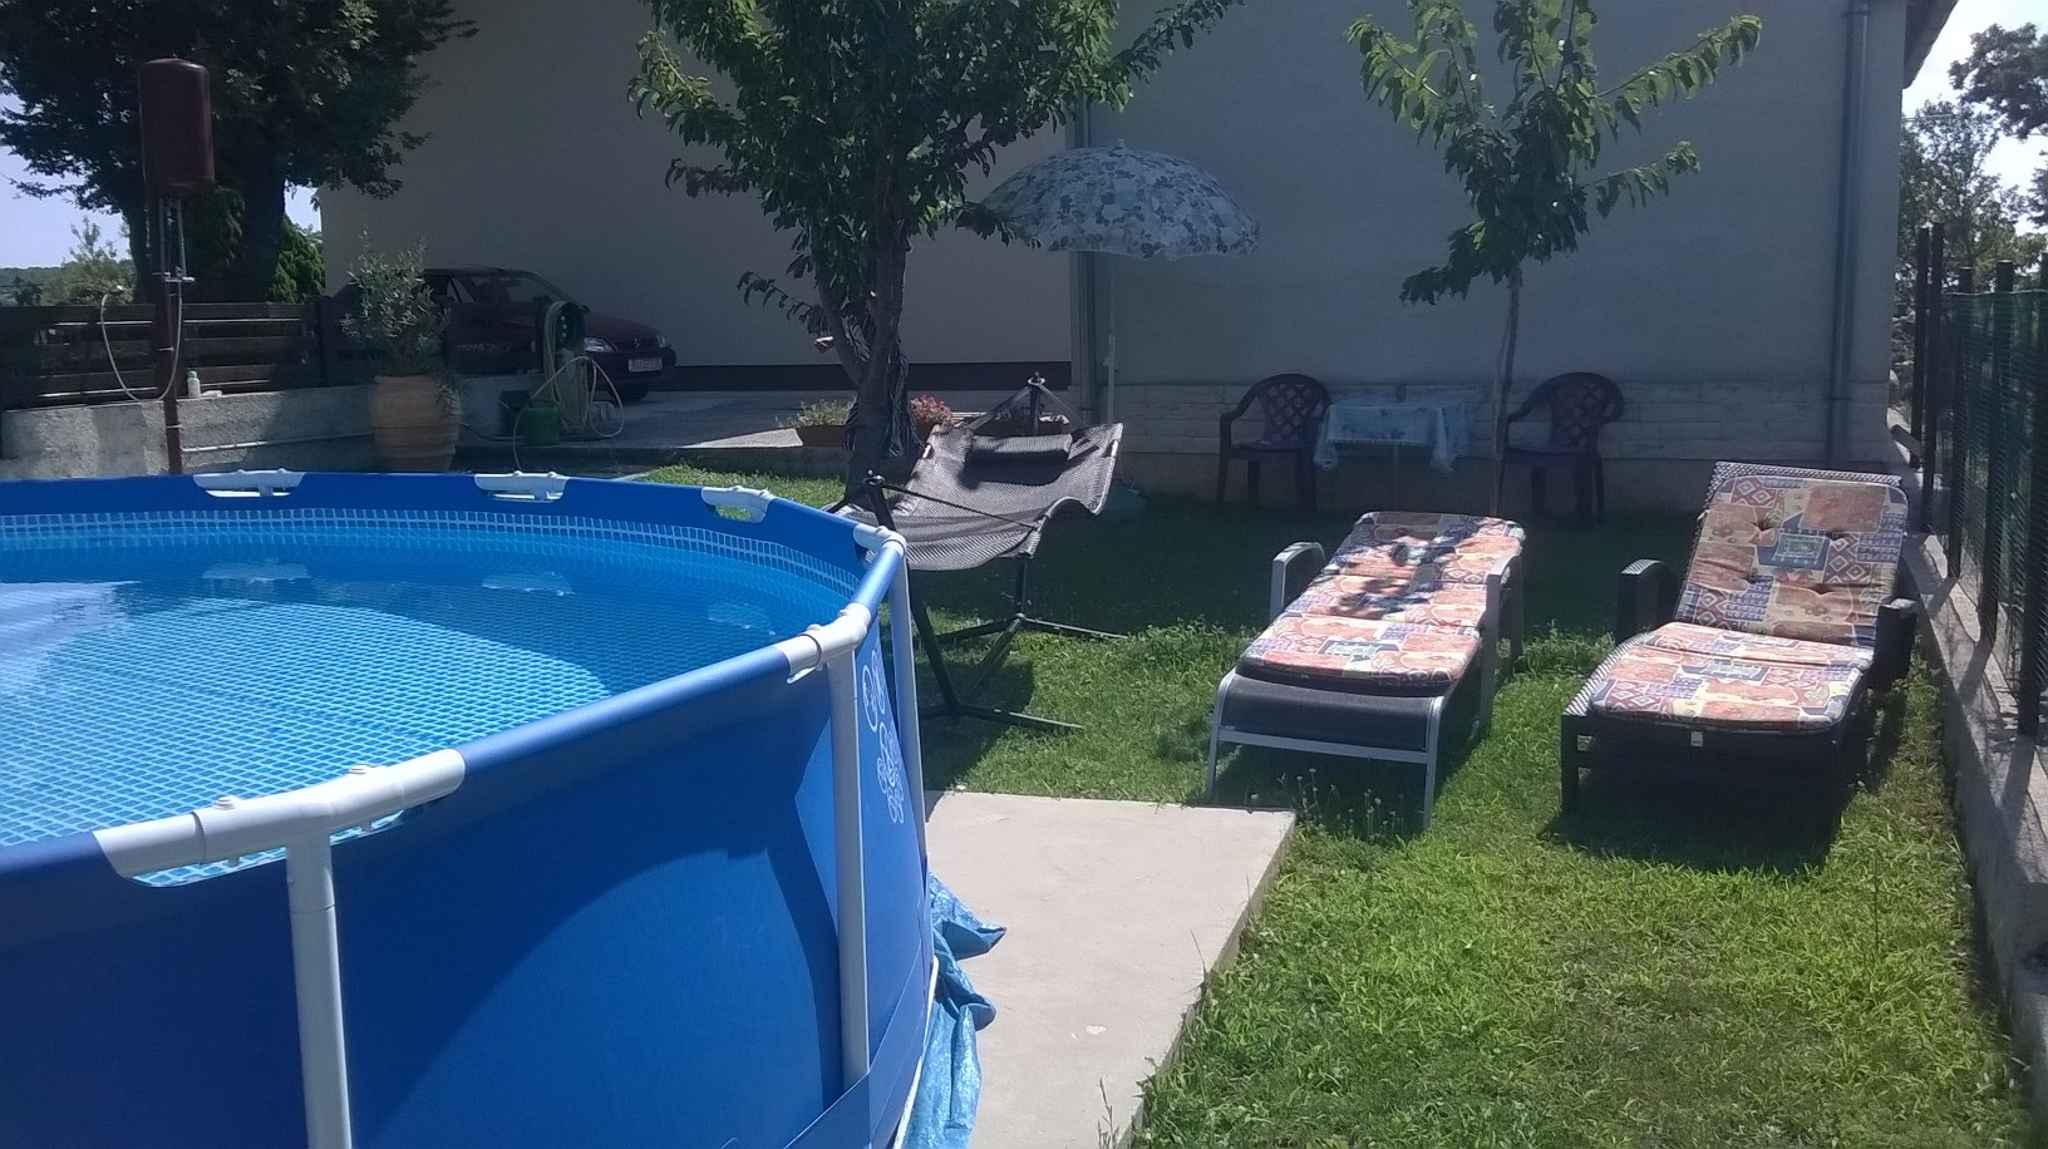 Appartement de vacances s ljetnom kuhinjom i bazenom (648047), Grižane, , Kvarner, Croatie, image 9